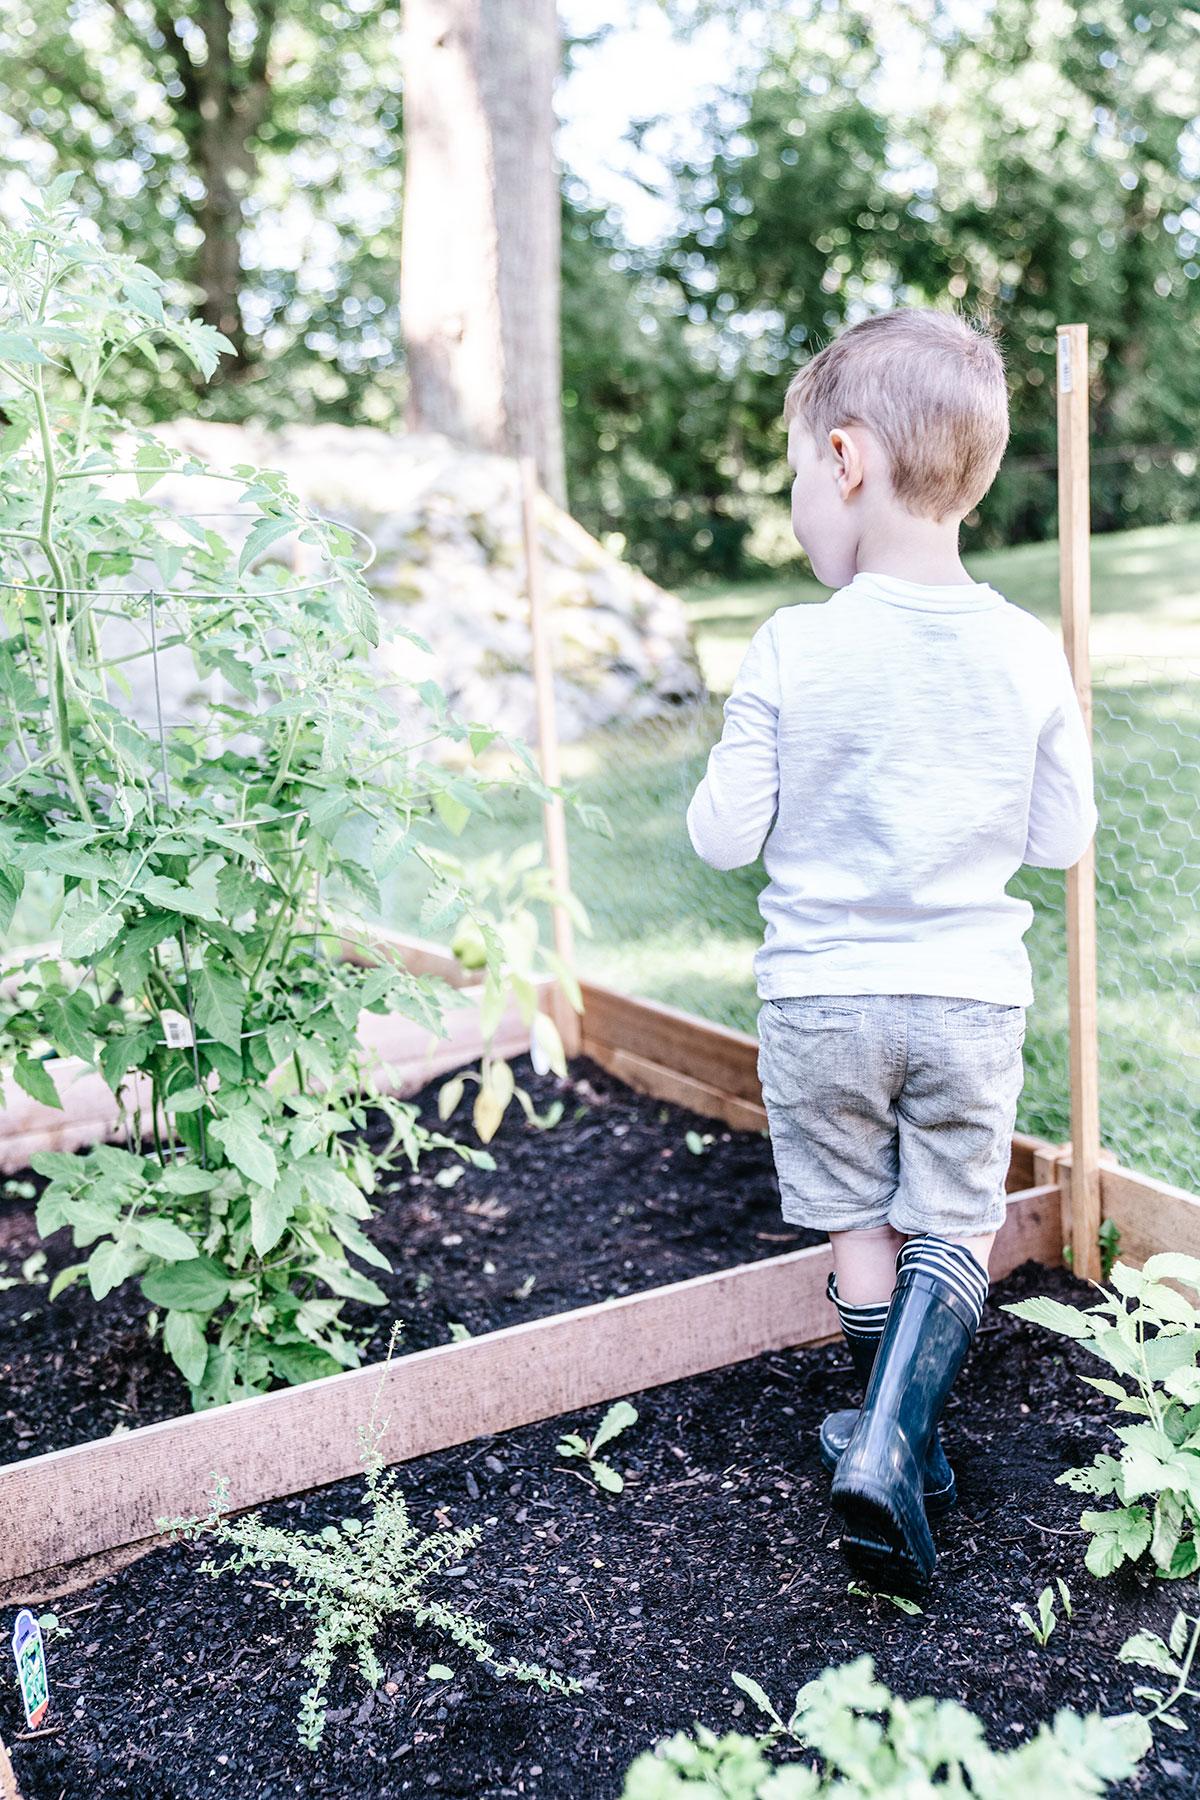 Easy-Beginner-Guide-Plant-Your-Organic-Backyard-Garden-In-One-Weekend